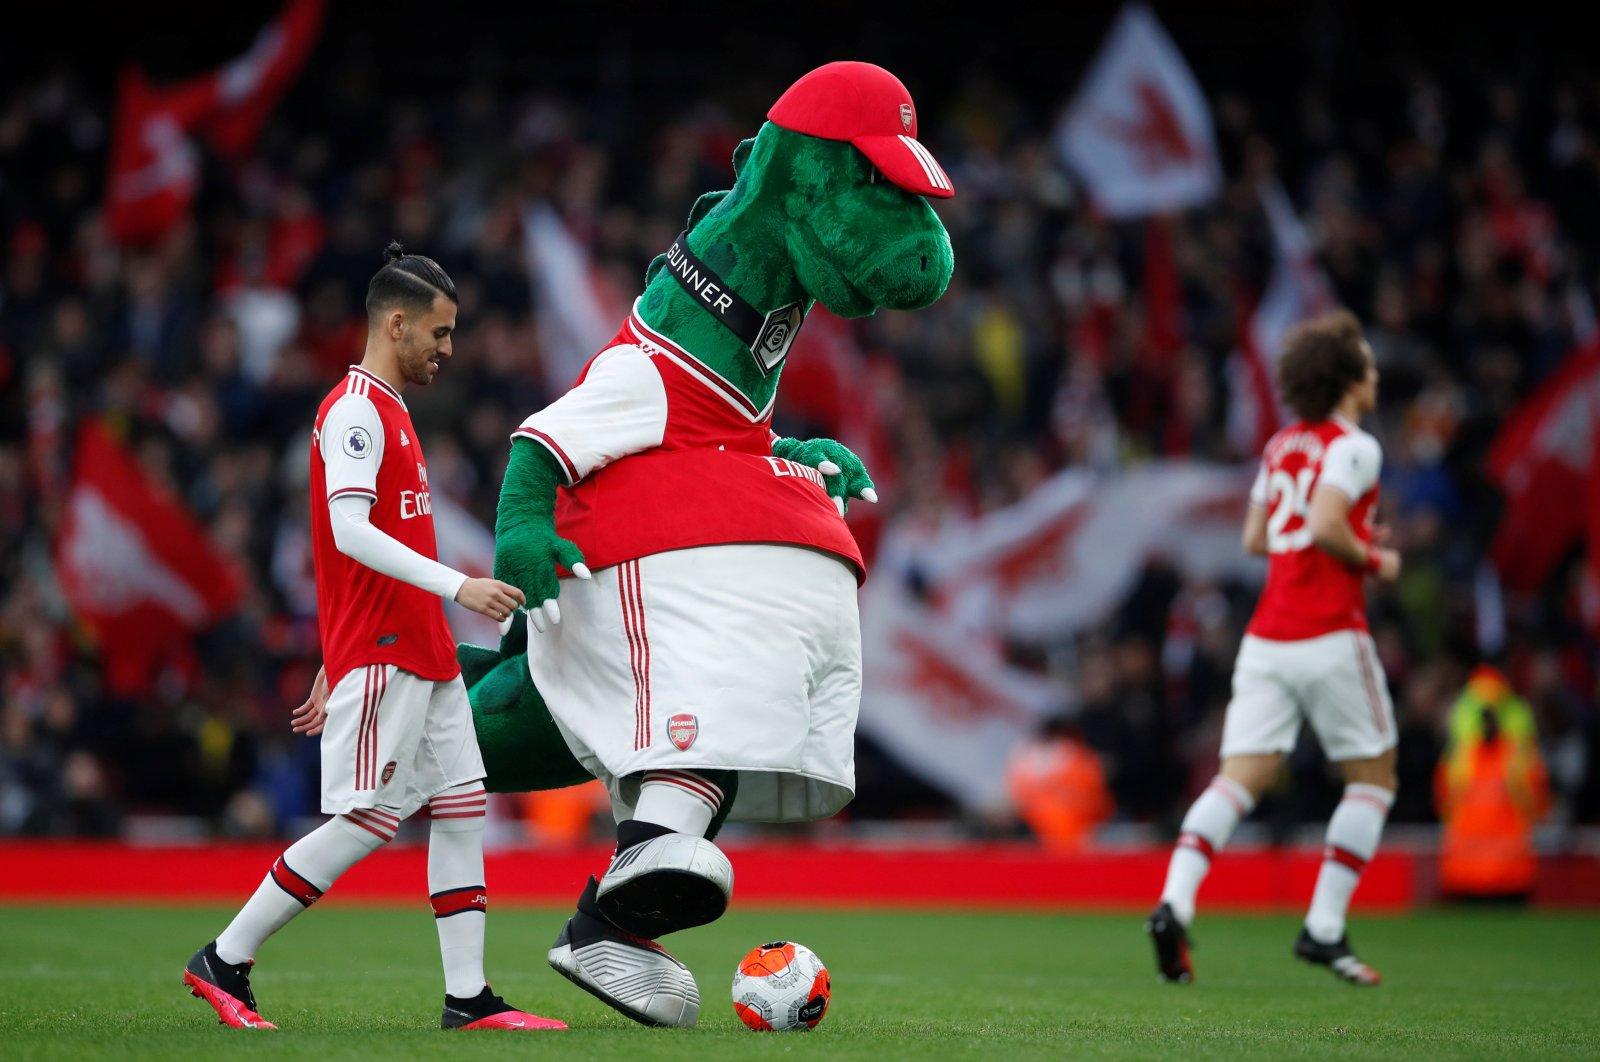 Arsenal's Dani Ceballos with with mascot Gunnersaurus before the match, in London, Britain, Feb. 23, 2020. (REUTERS Photo)